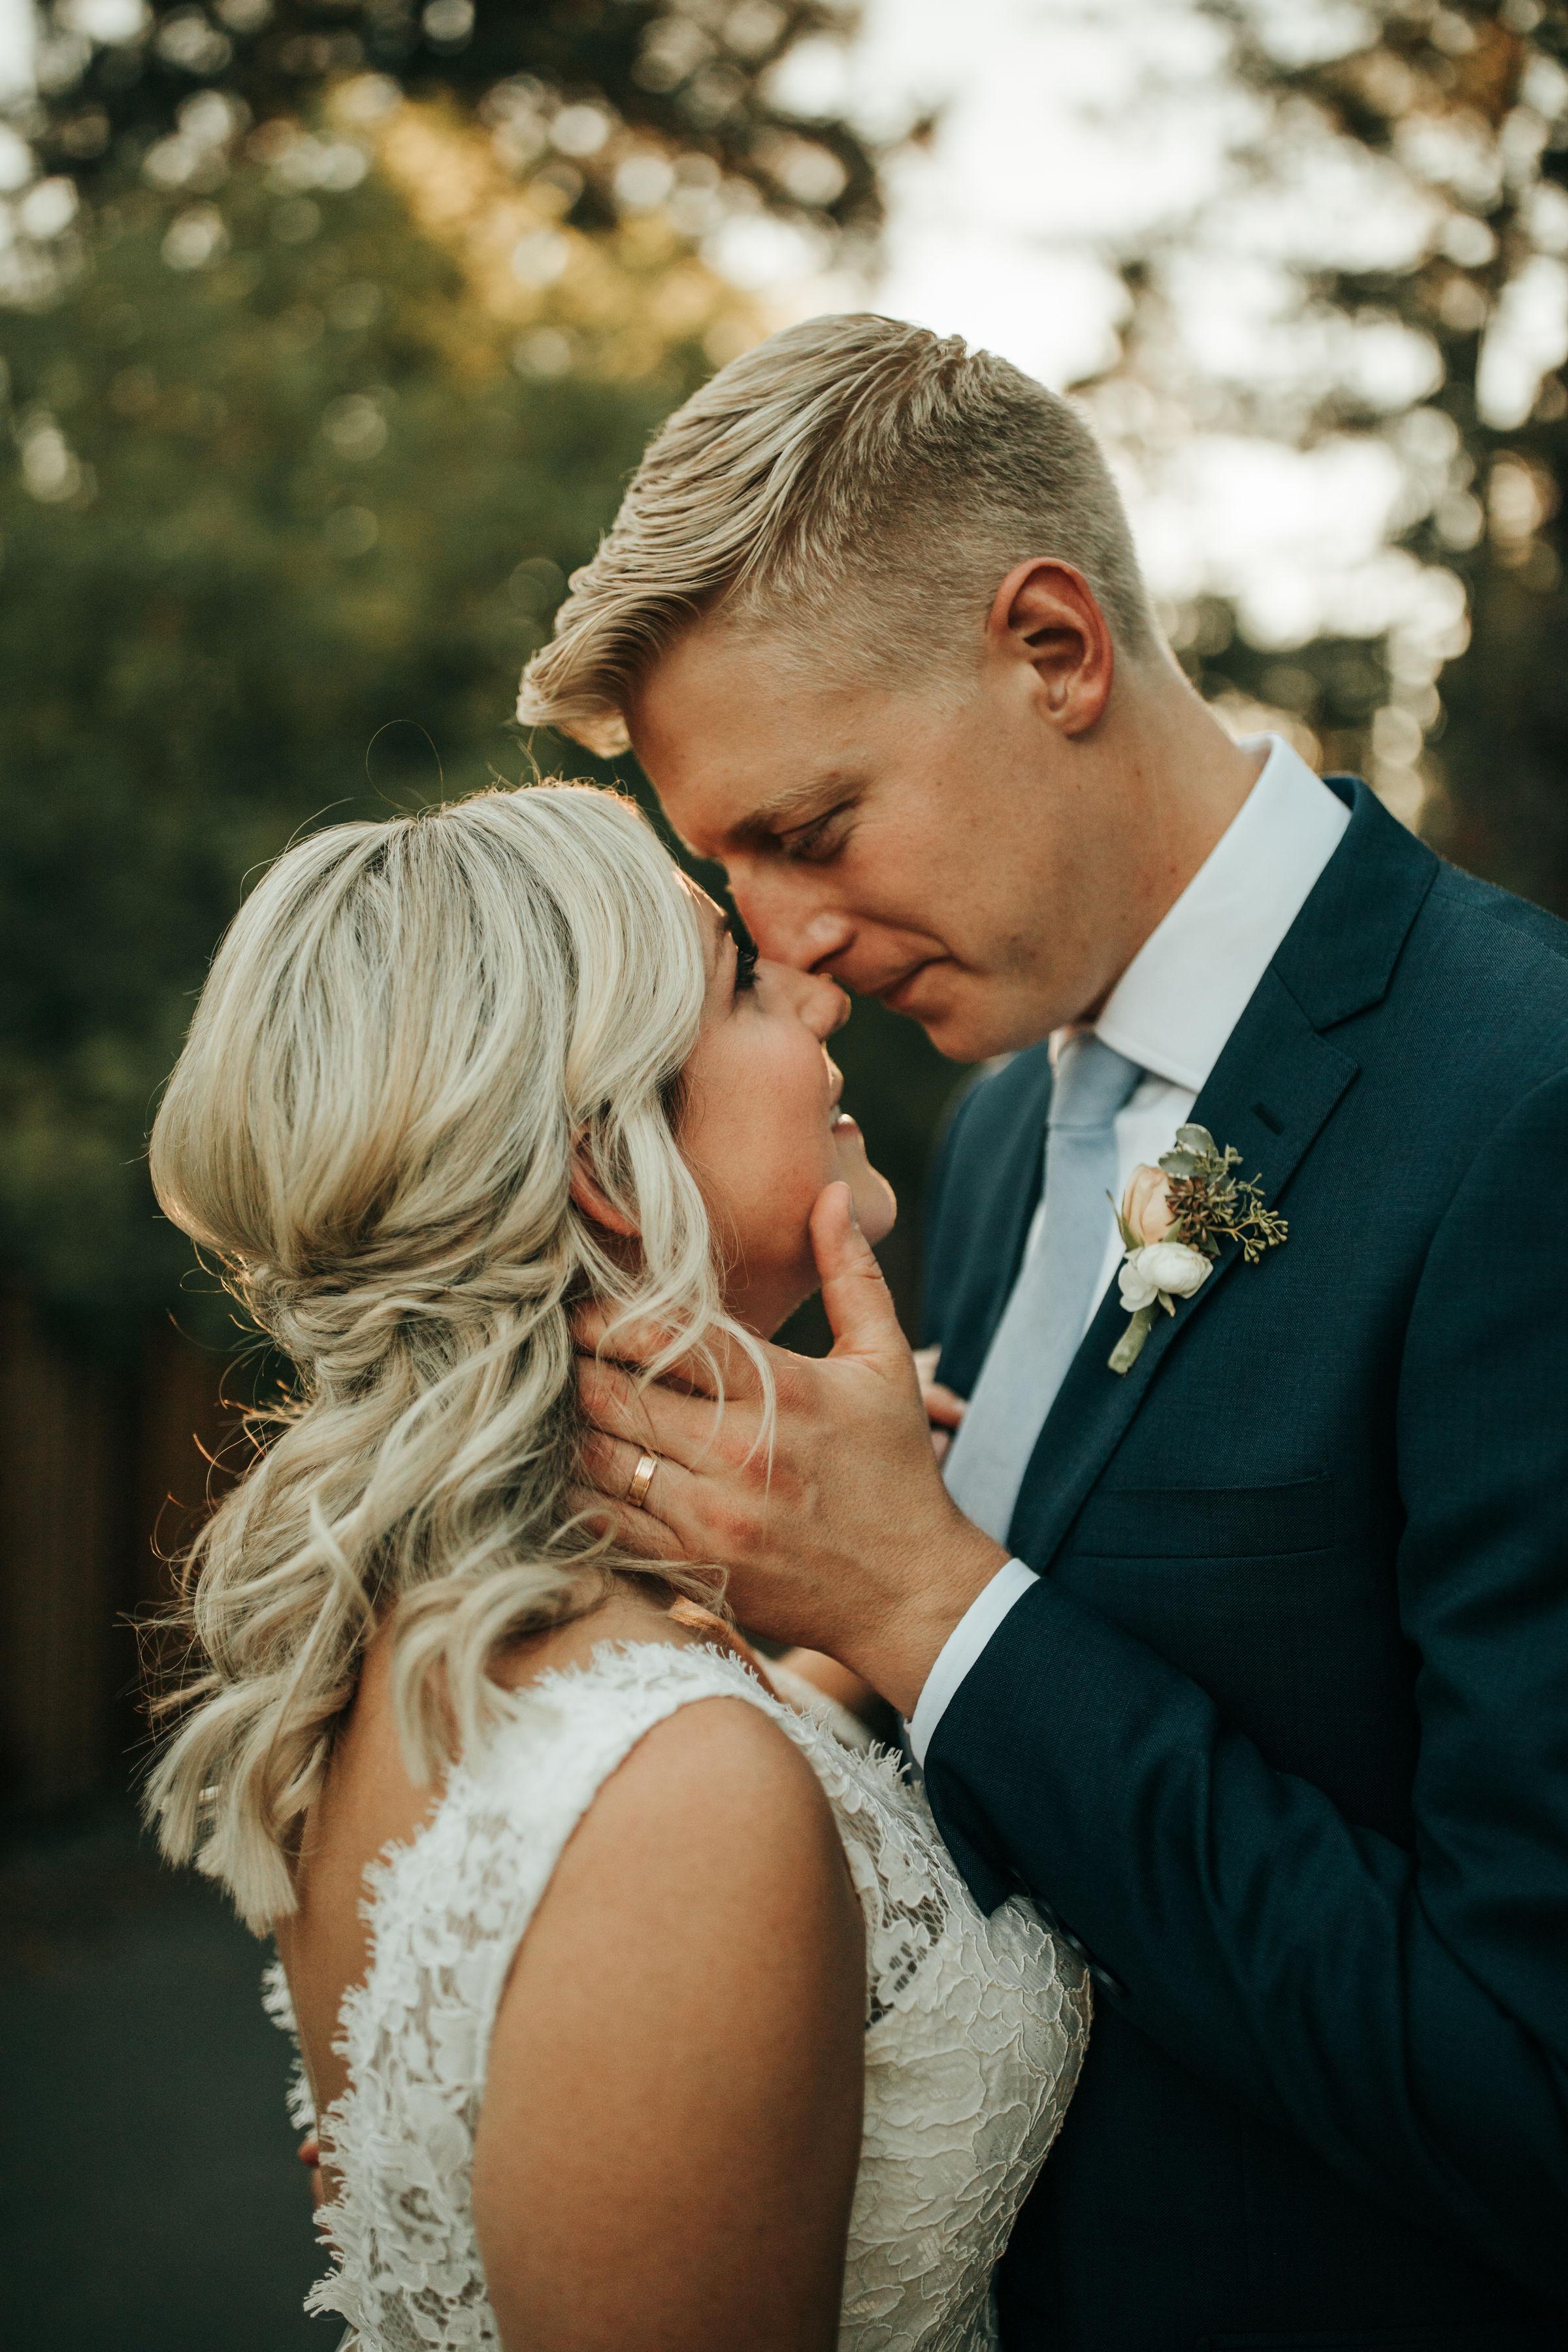 Bridal Hair Stylist in Napa California